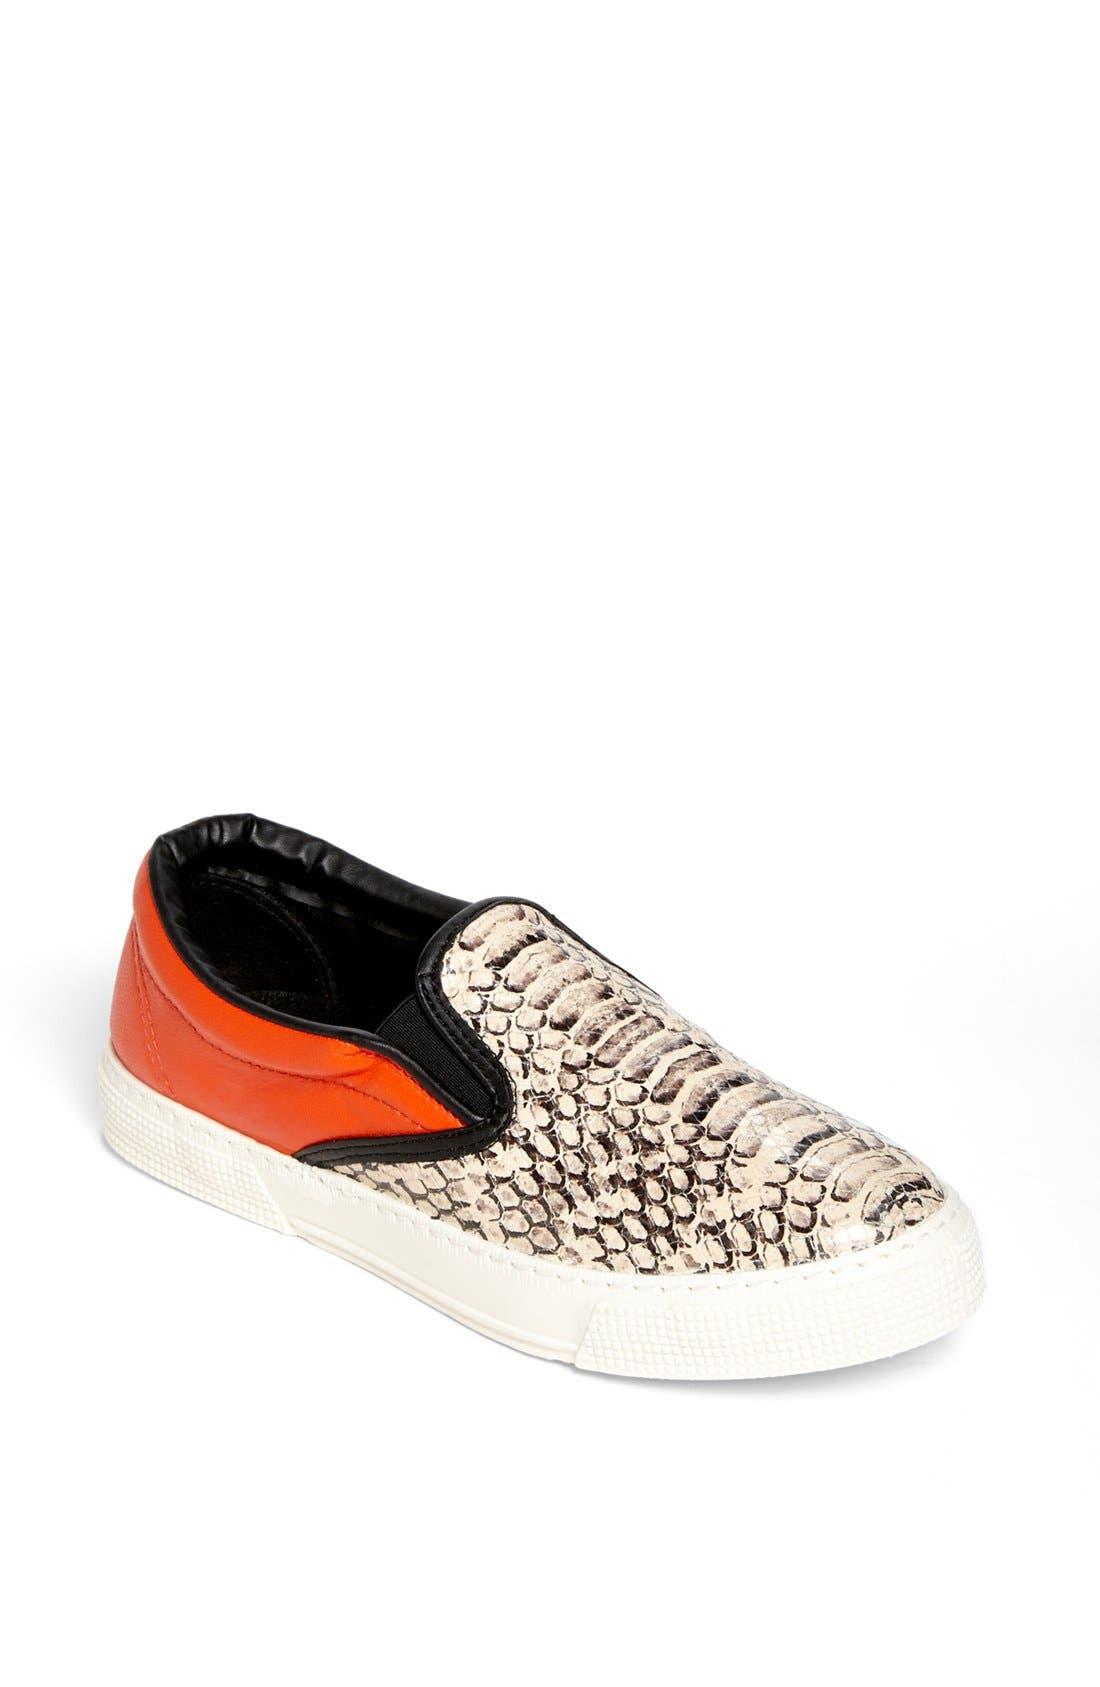 Alternate Image 1 Selected - Kurt Geiger London Slip-On Sneaker